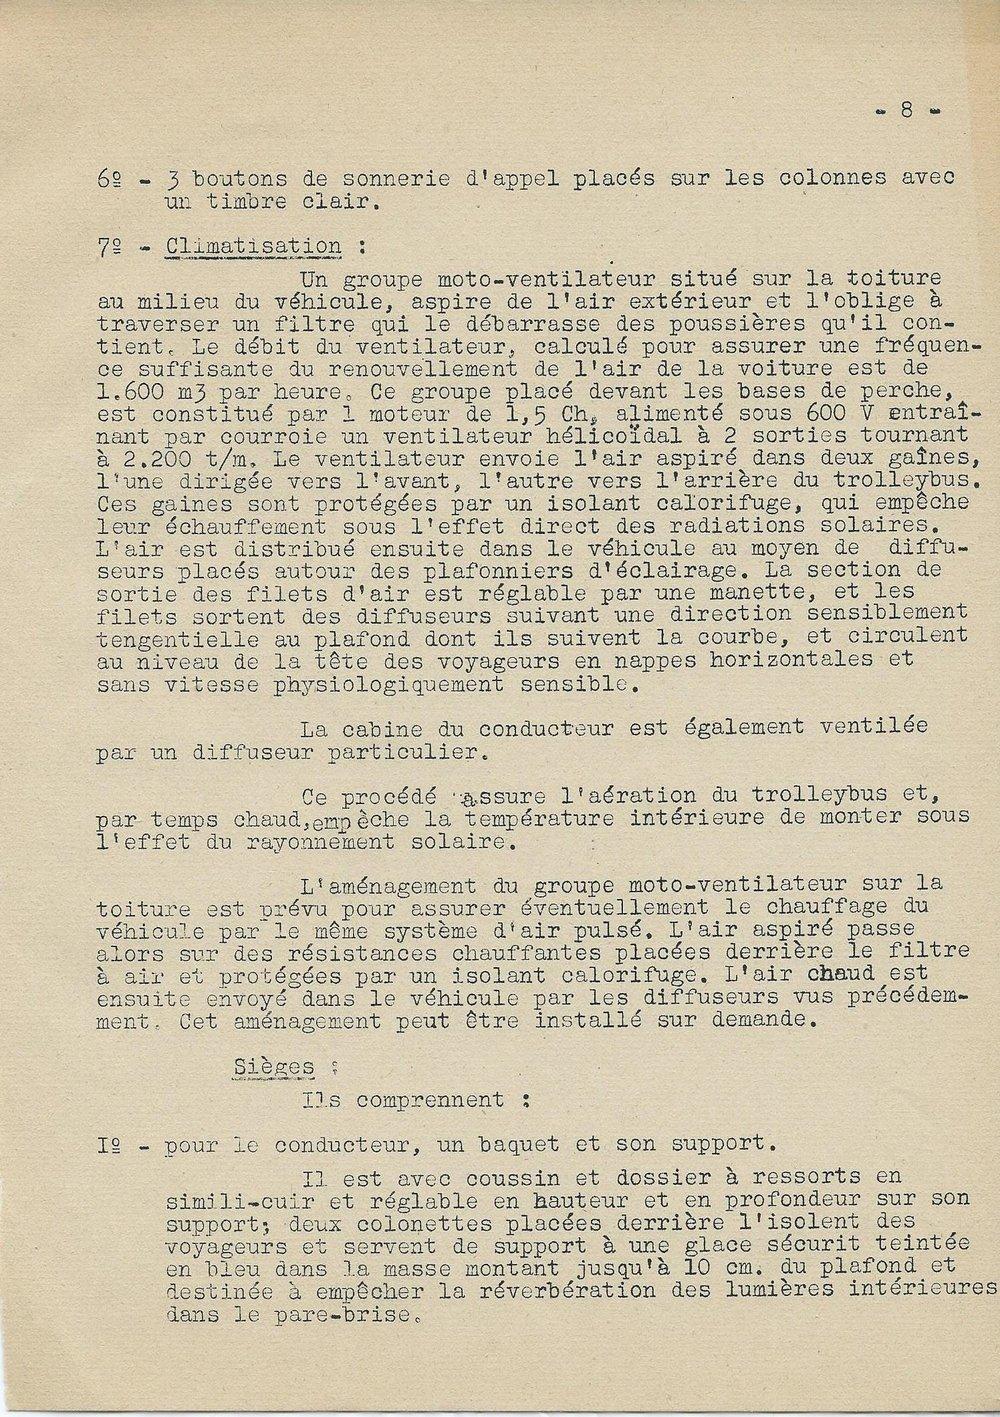 VRBh, série Aix-Marseille, str. 8